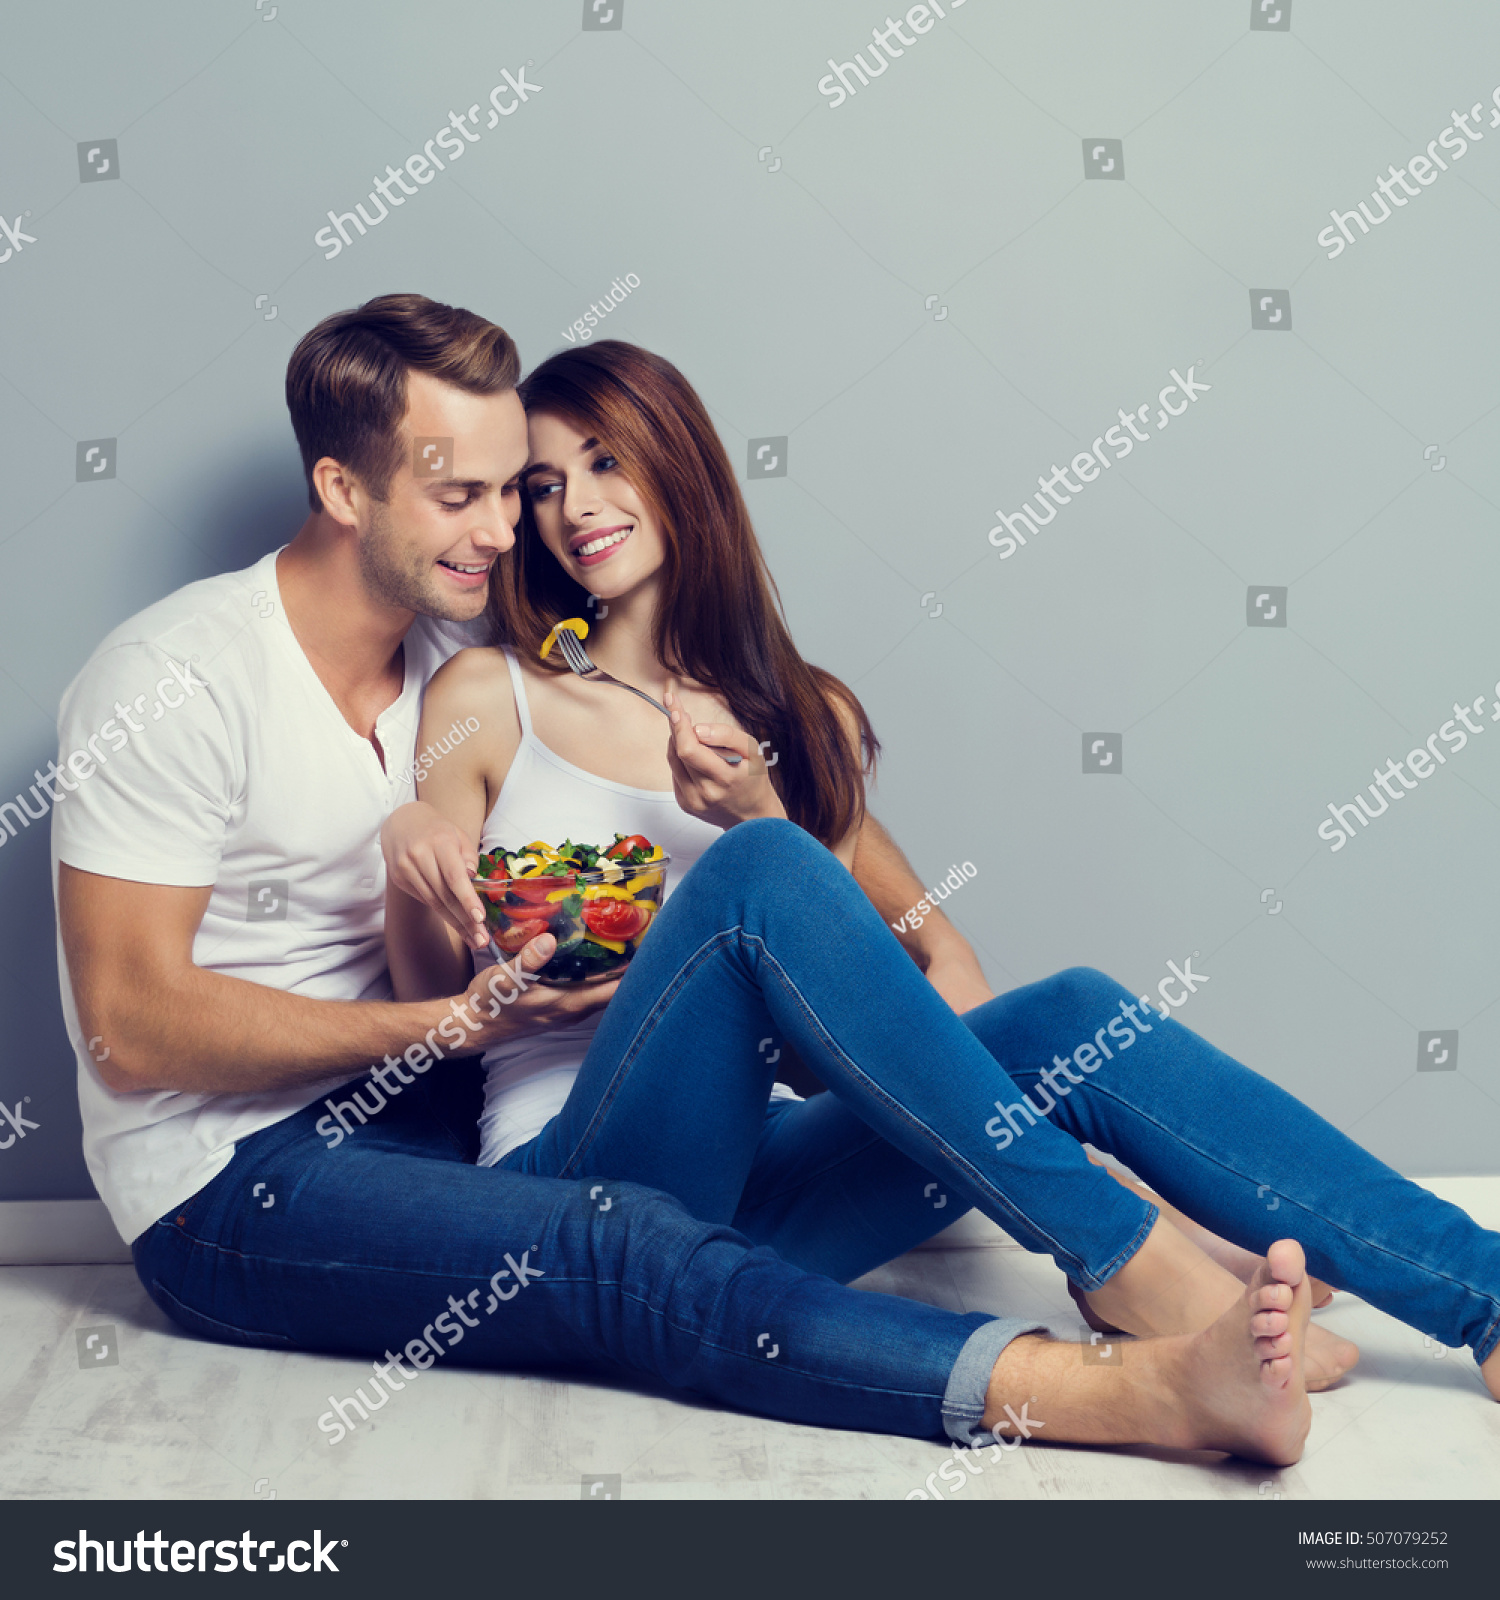 Beautiful Young Playful Couple Eating Salad Stock Photo 507079252 ...